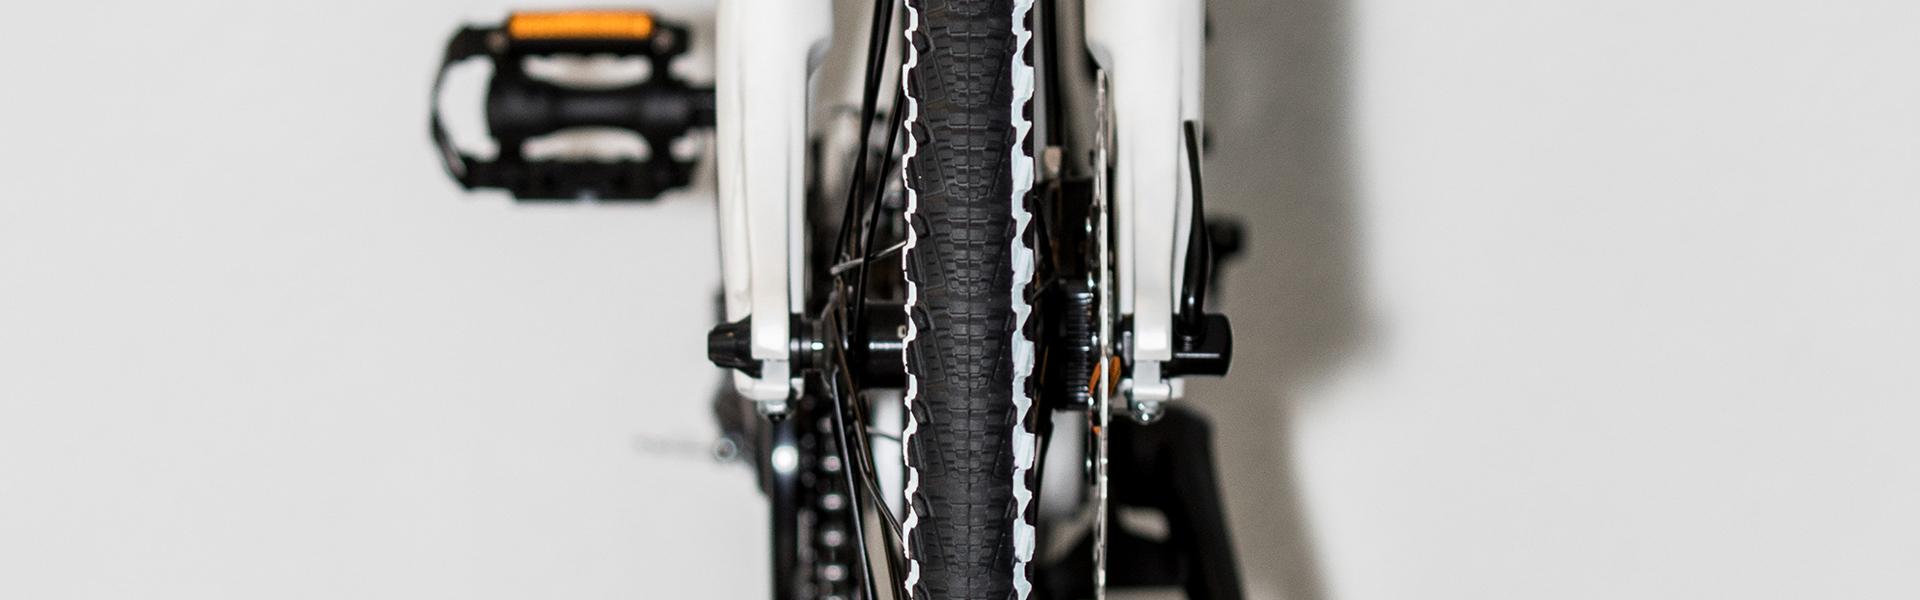 Top-Fahrradmarken